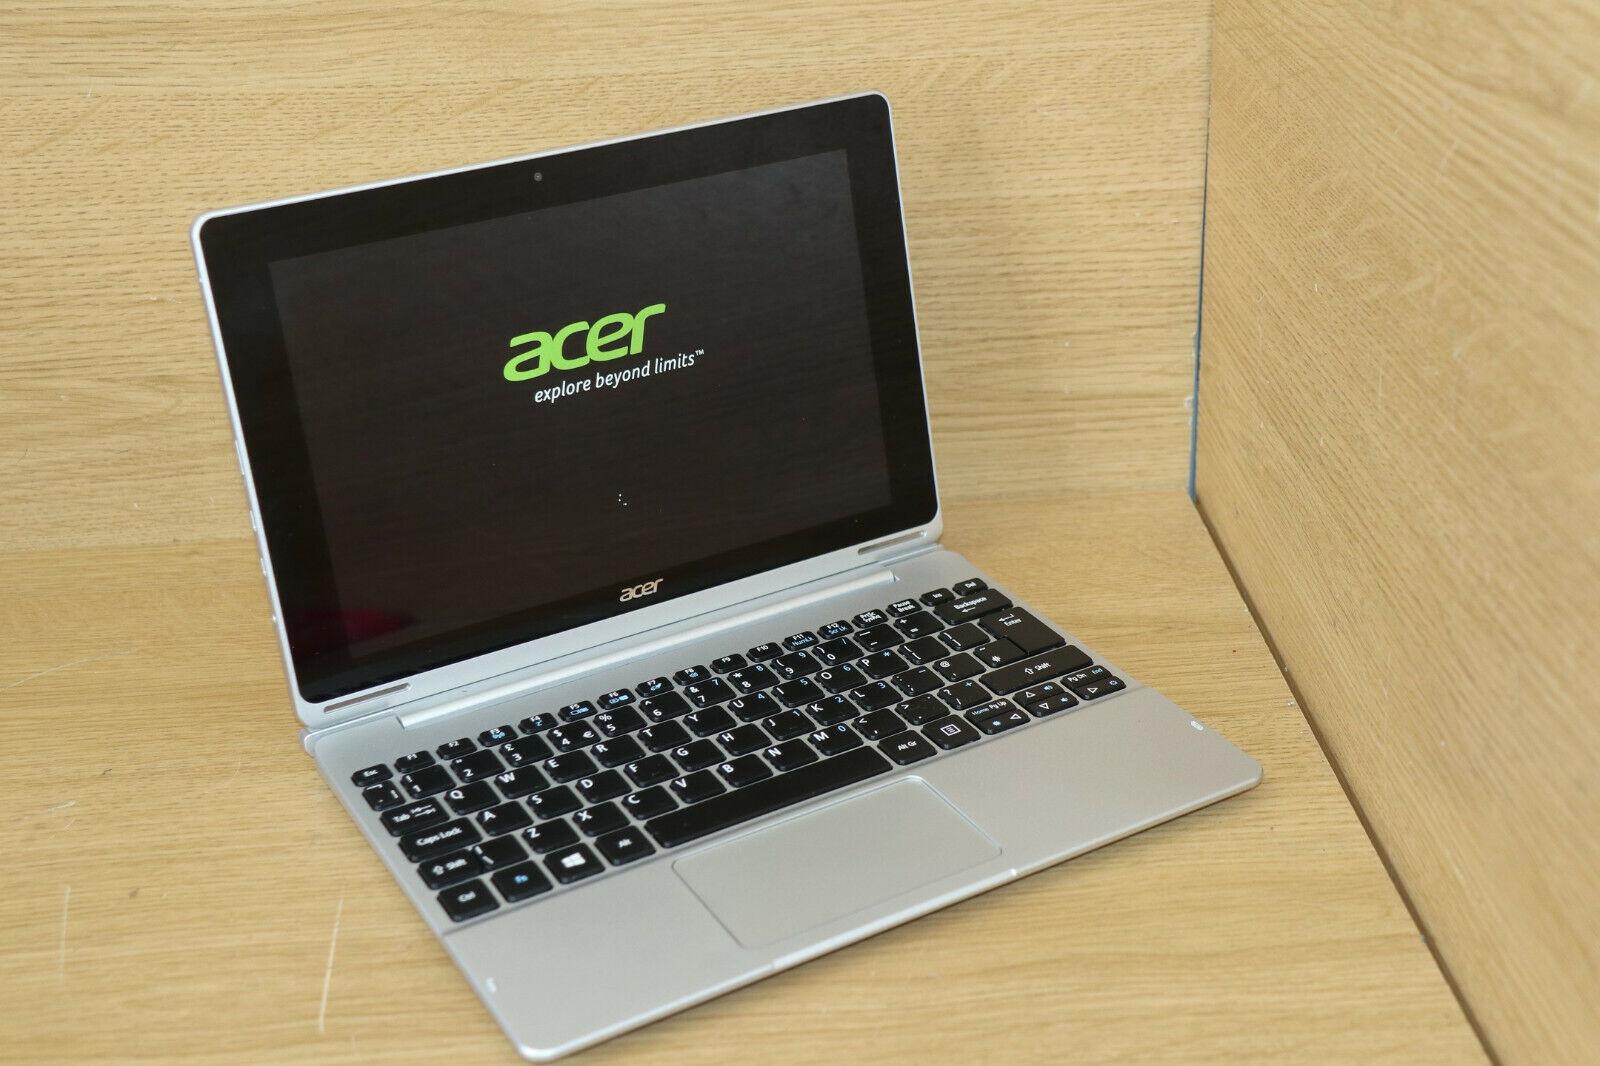 Laptop Windows - Acer Aspire Switch 10 SW5-012 Quad Core 1.33GHZ  2GB 32GB WINDOWS 10 HOME 2IN1